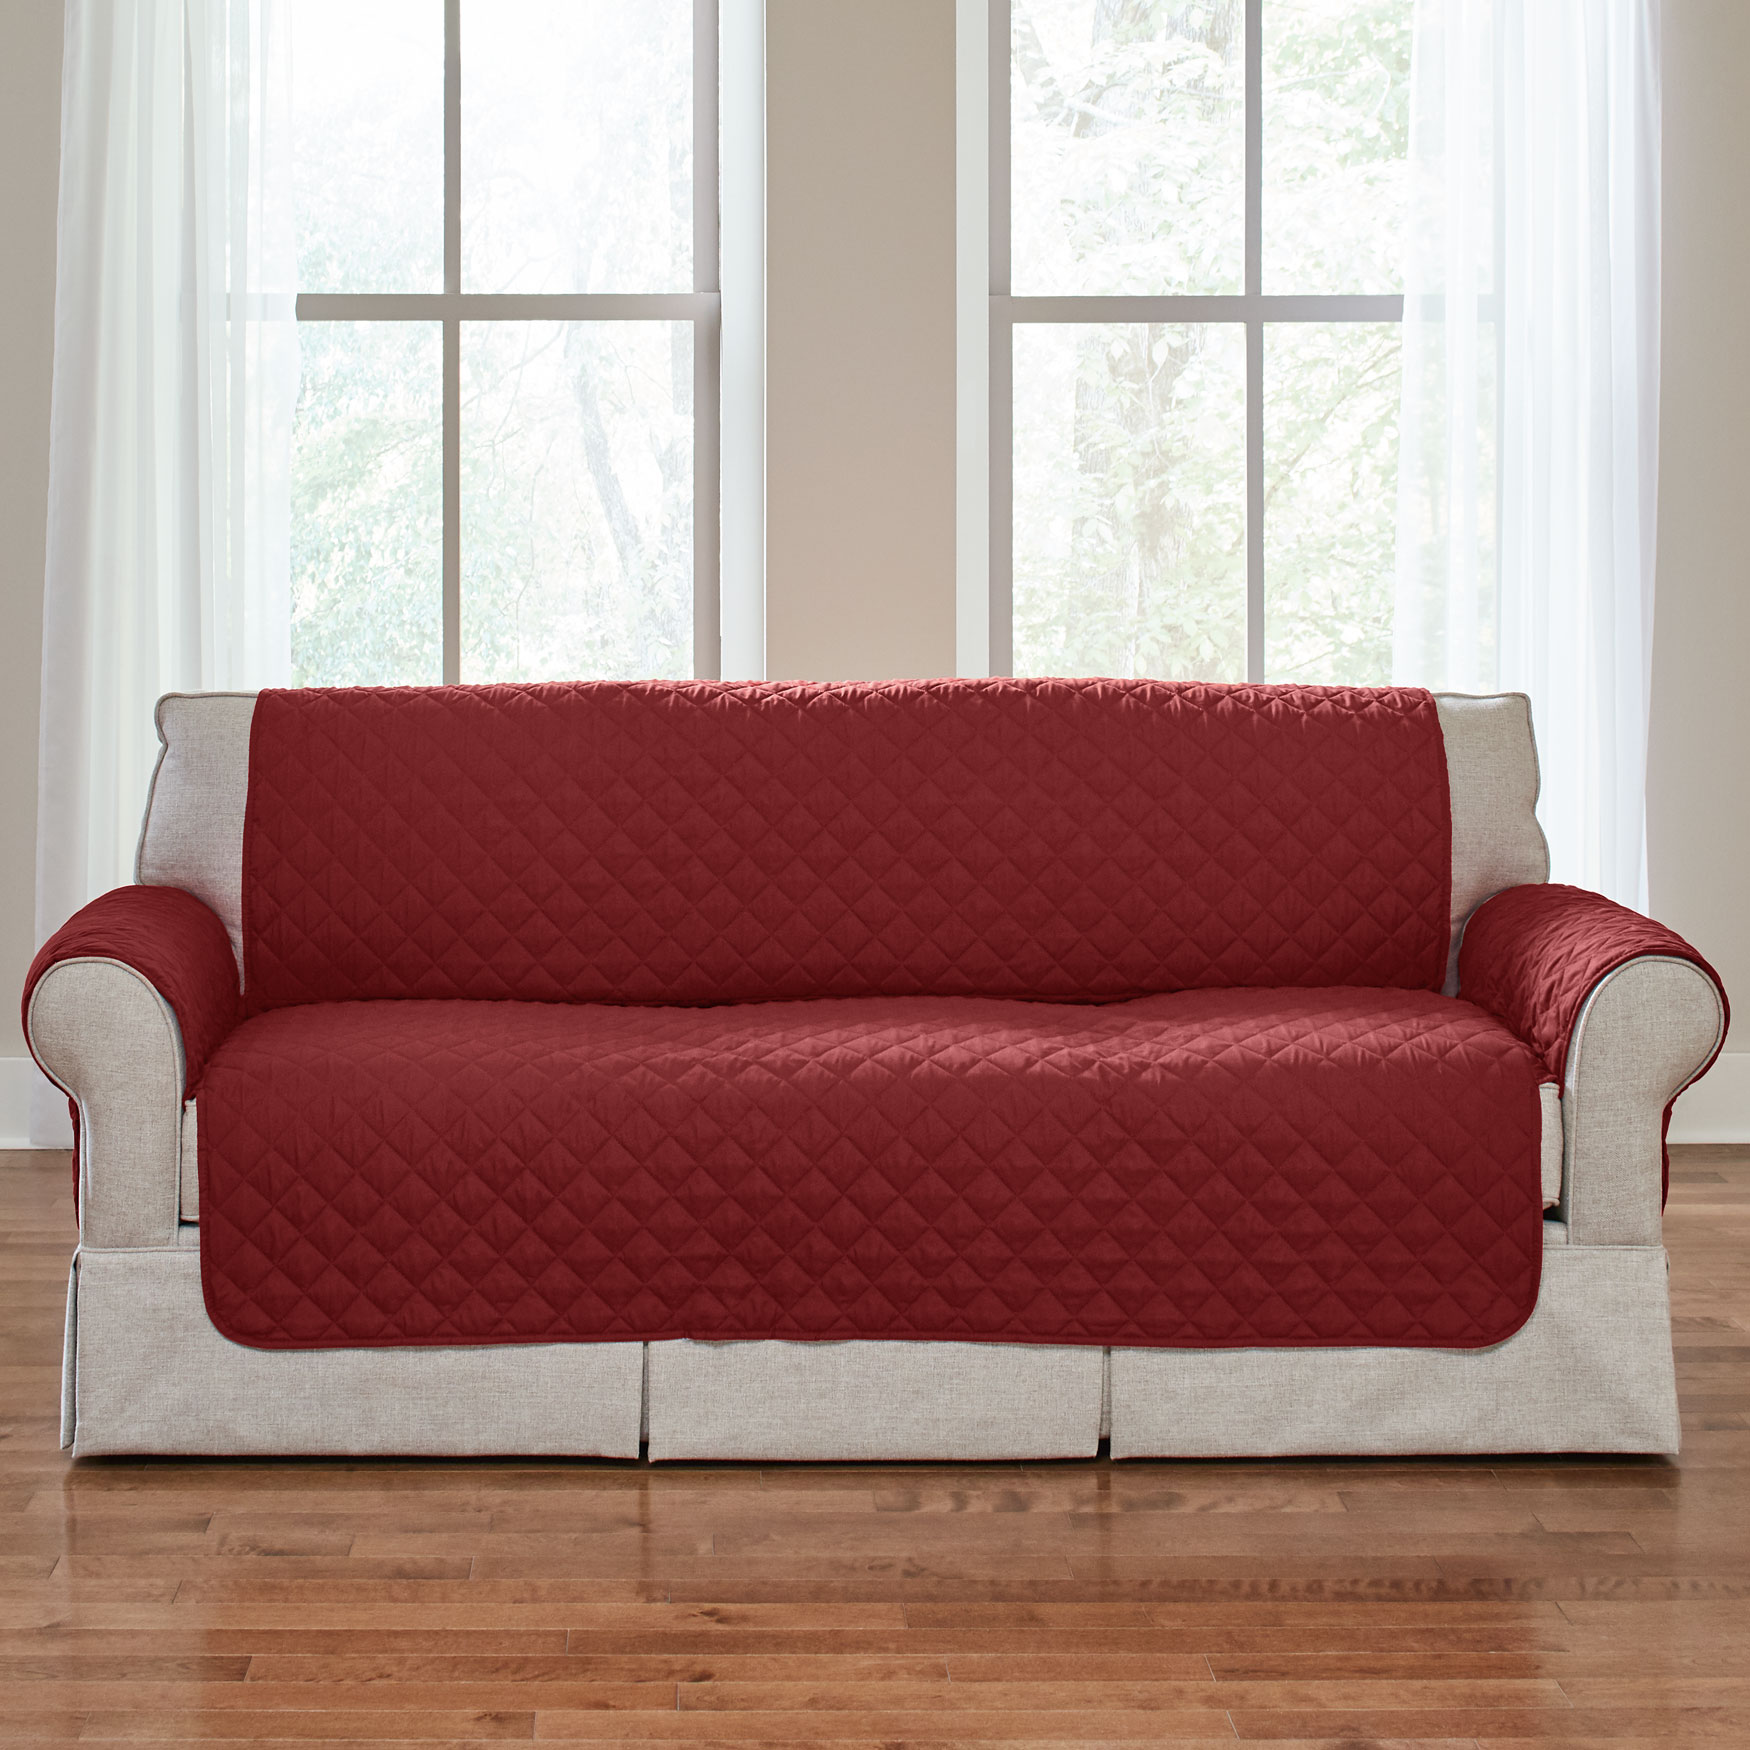 Bh Studio Water Repellent Microfiber Sofa Protector Merlot